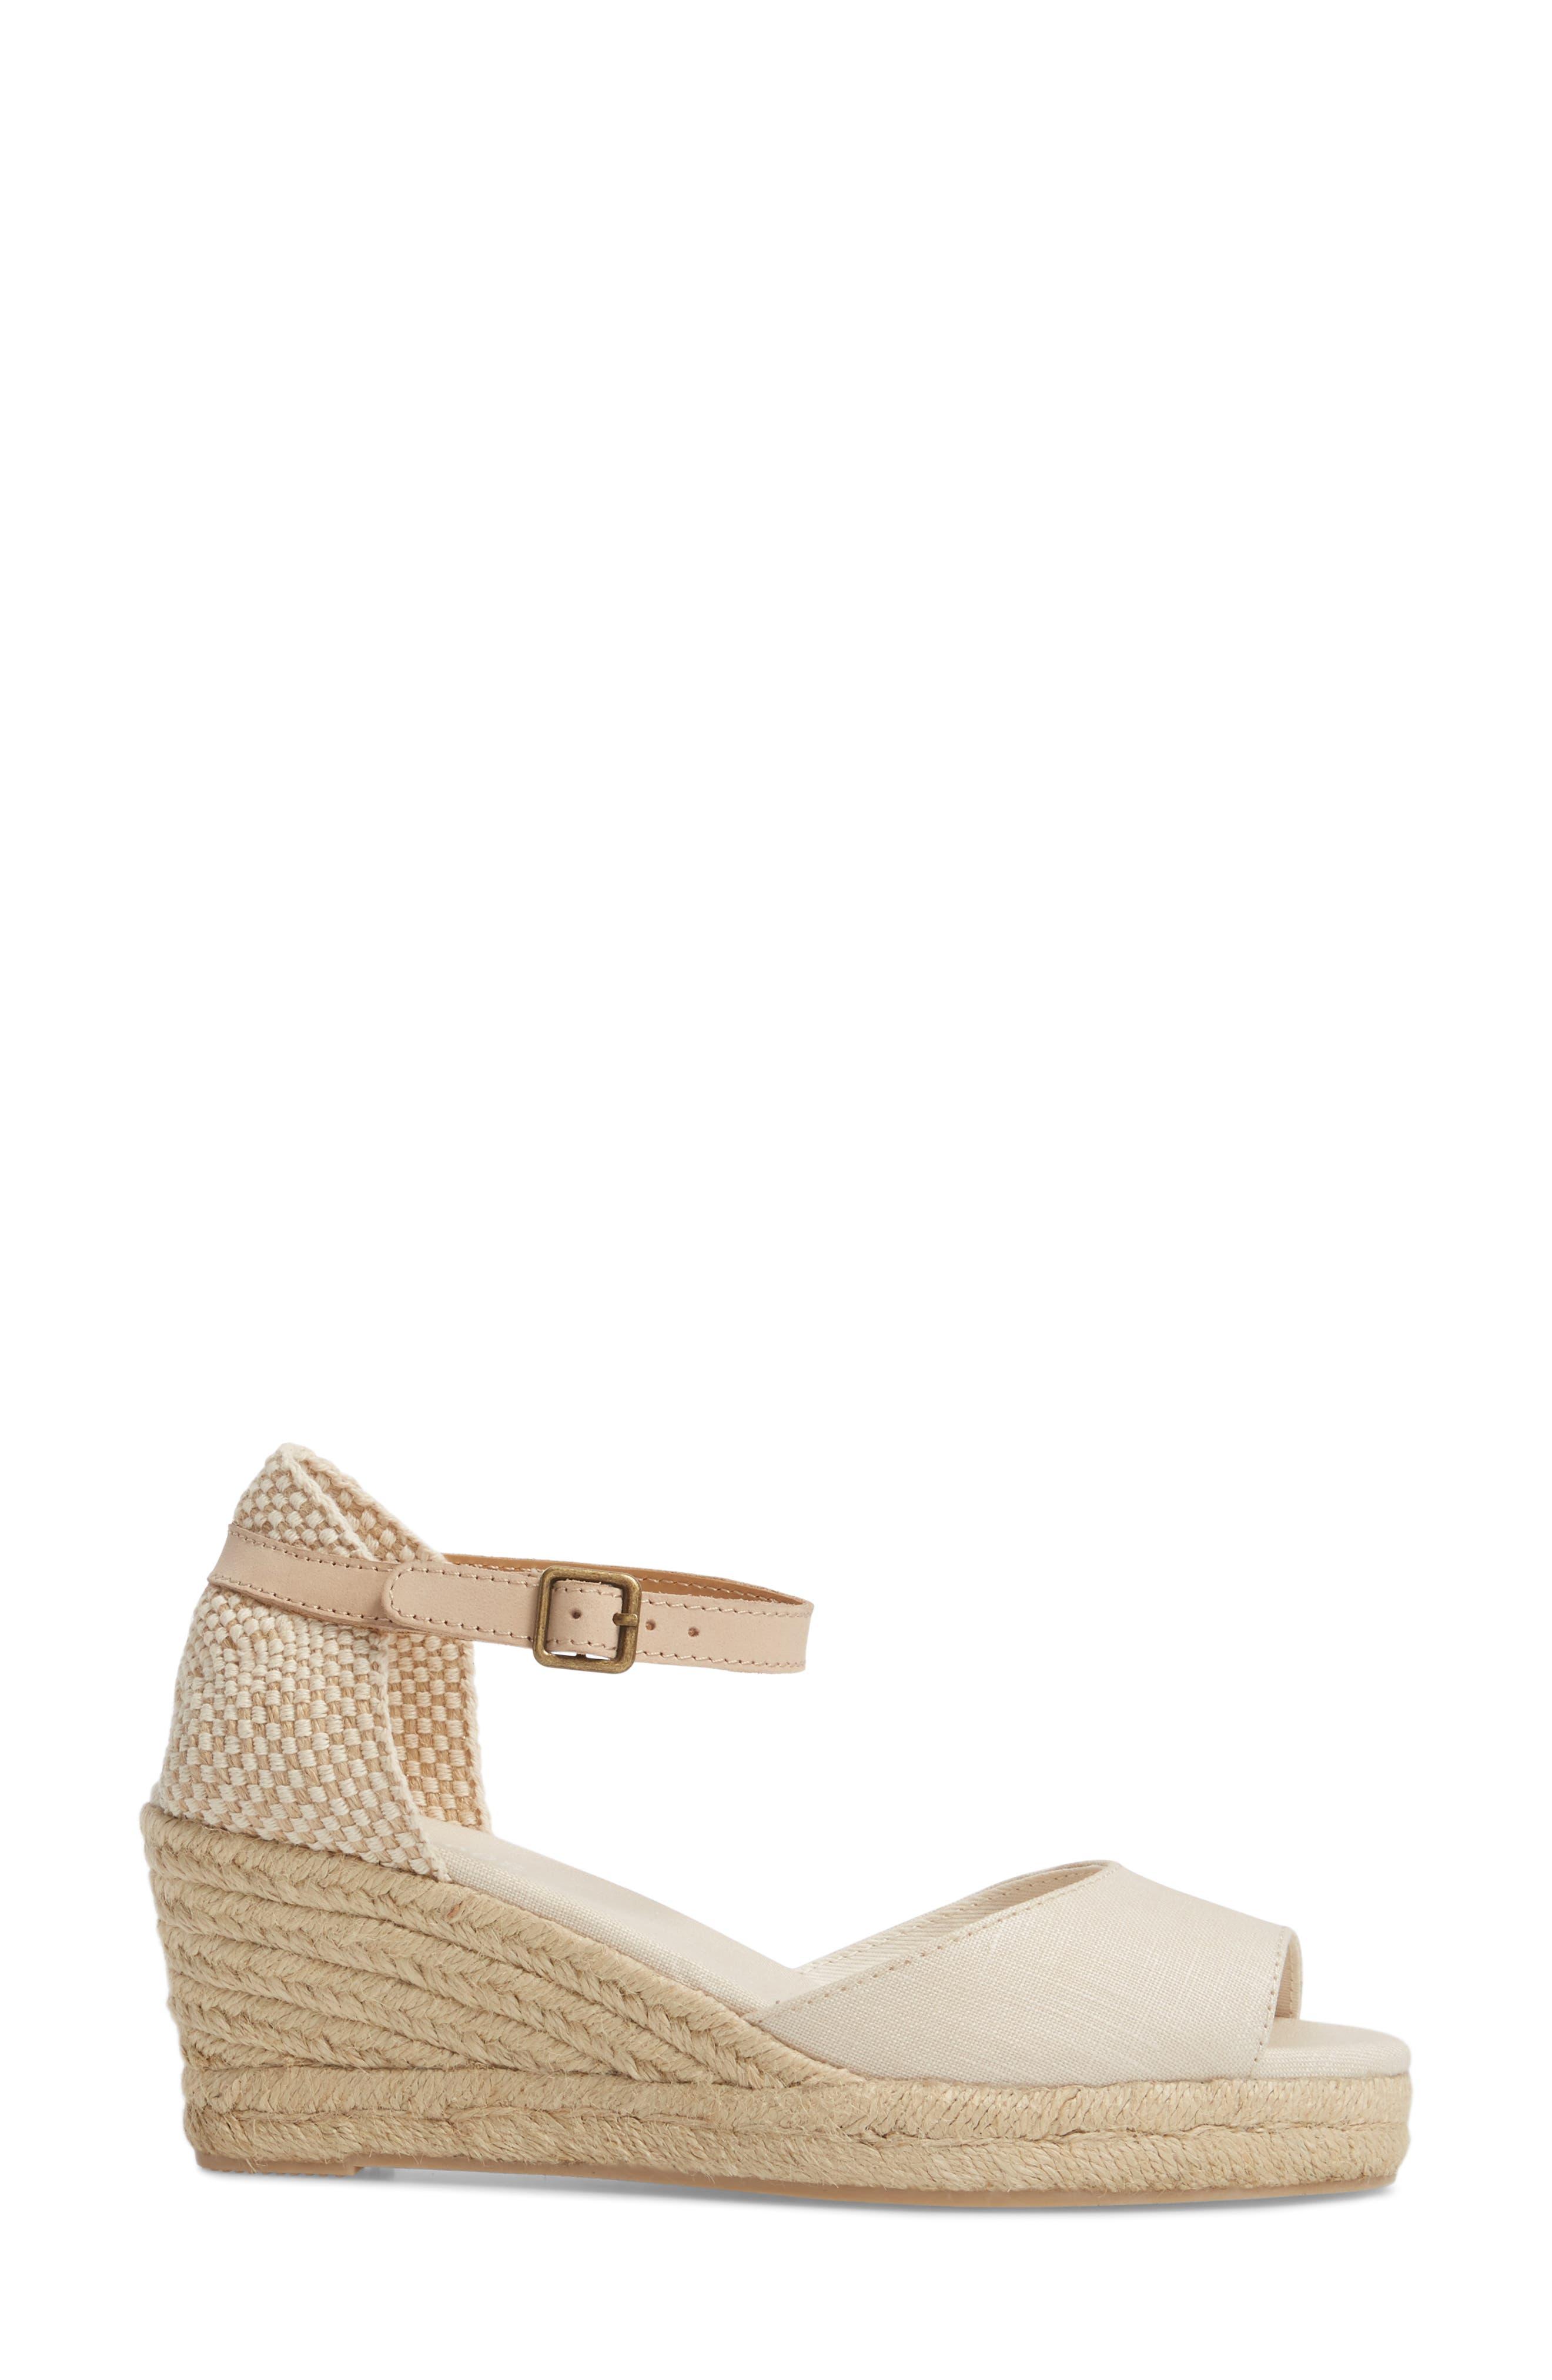 Espadrille Wedge Sandal,                             Alternate thumbnail 3, color,                             Blush Fabric